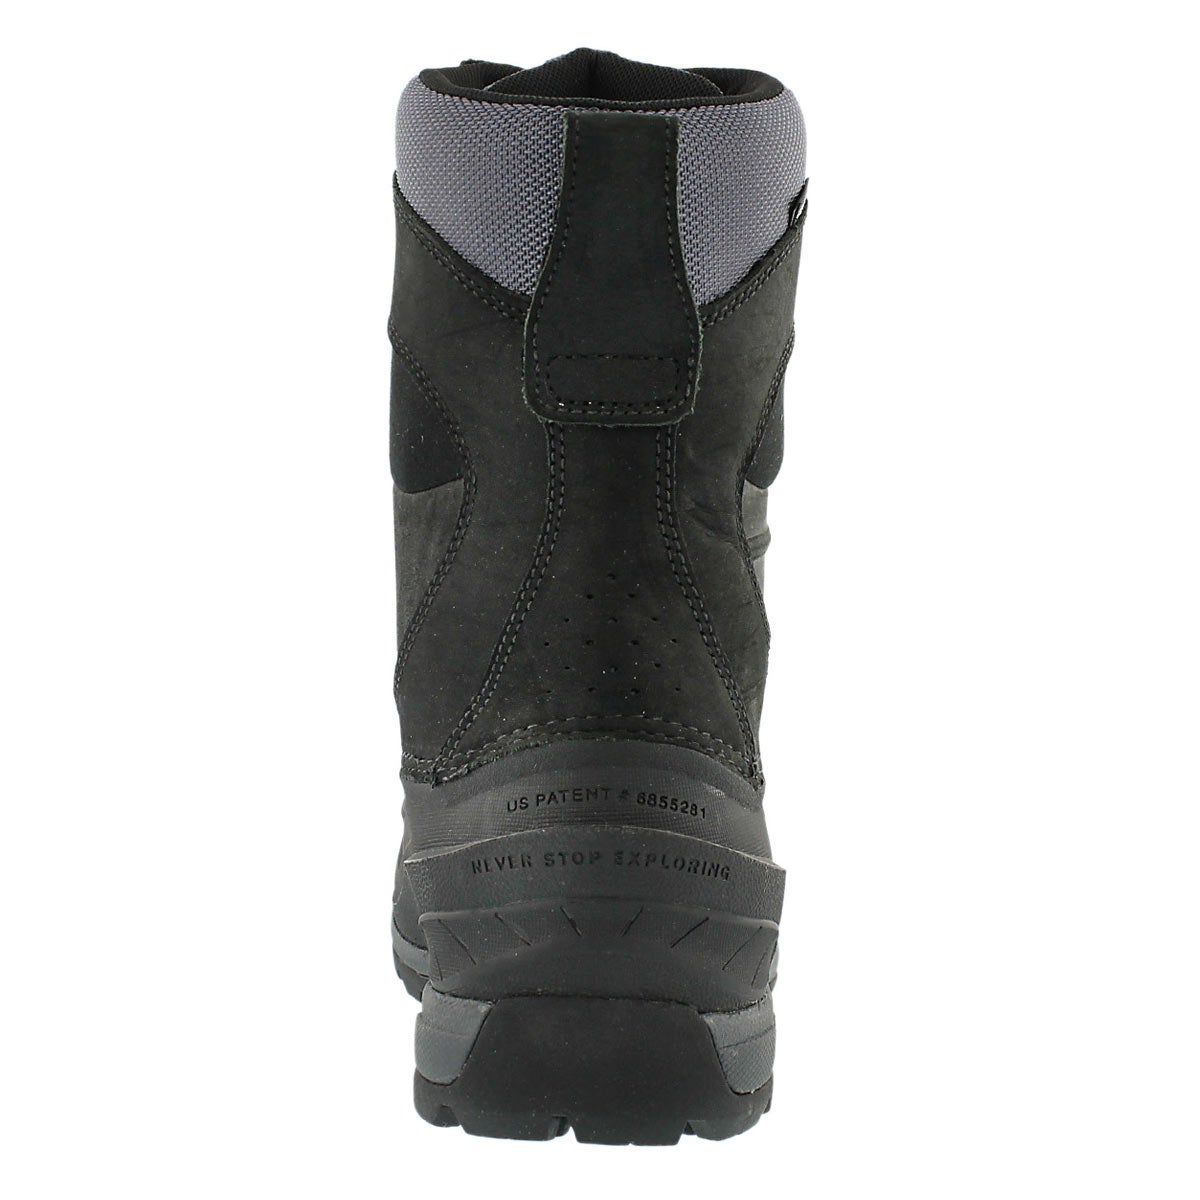 Mns Chilkat 400 blk/gry wtpf winter boot